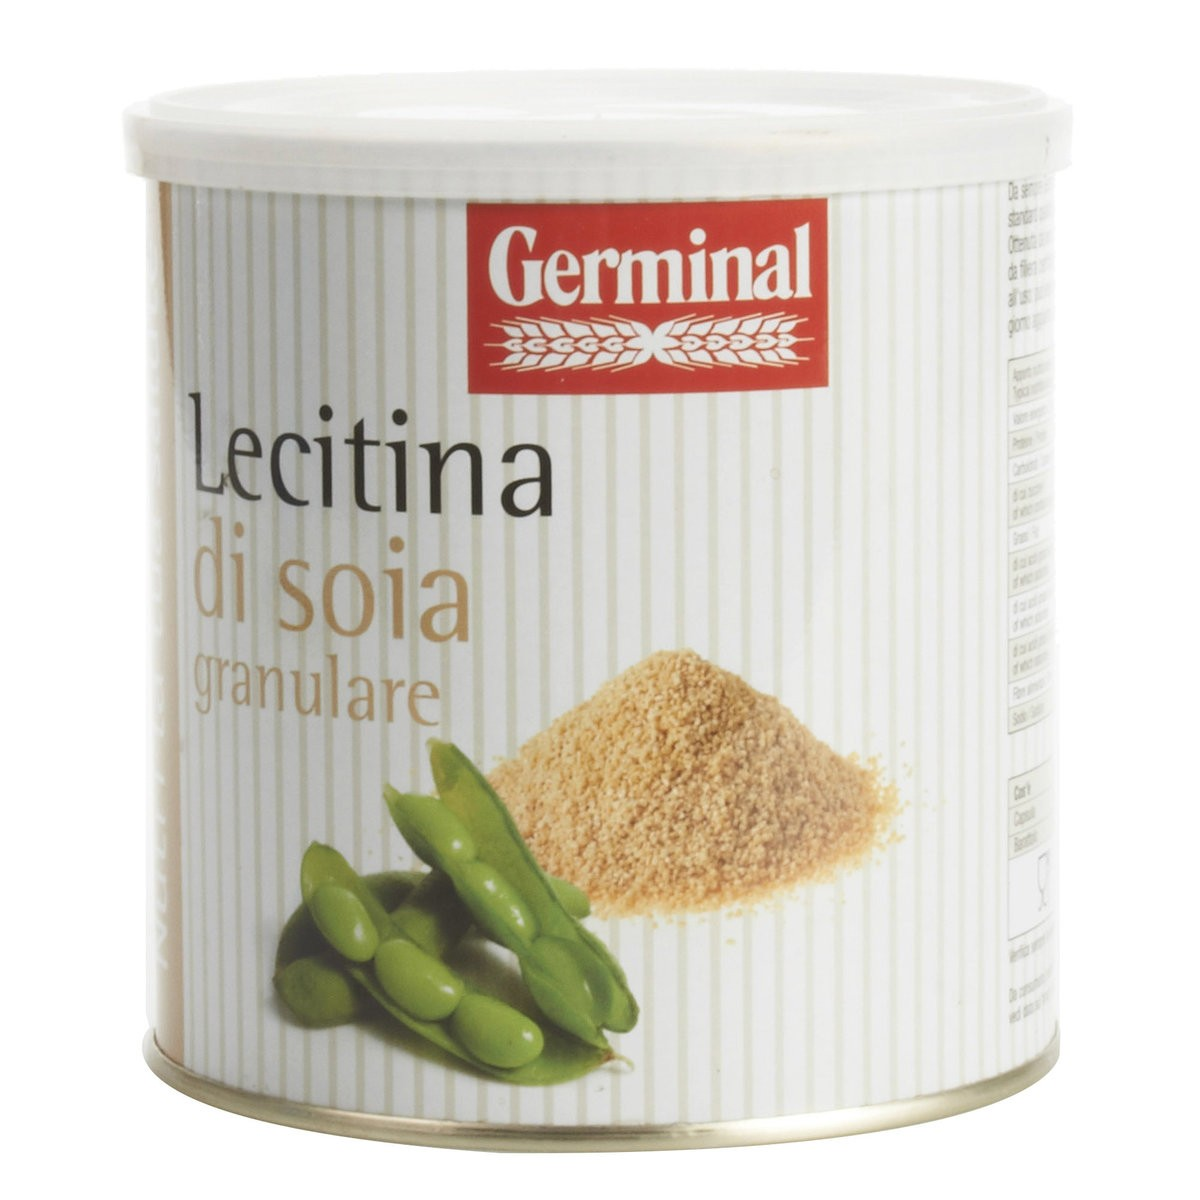 Lecitina di soia granulare